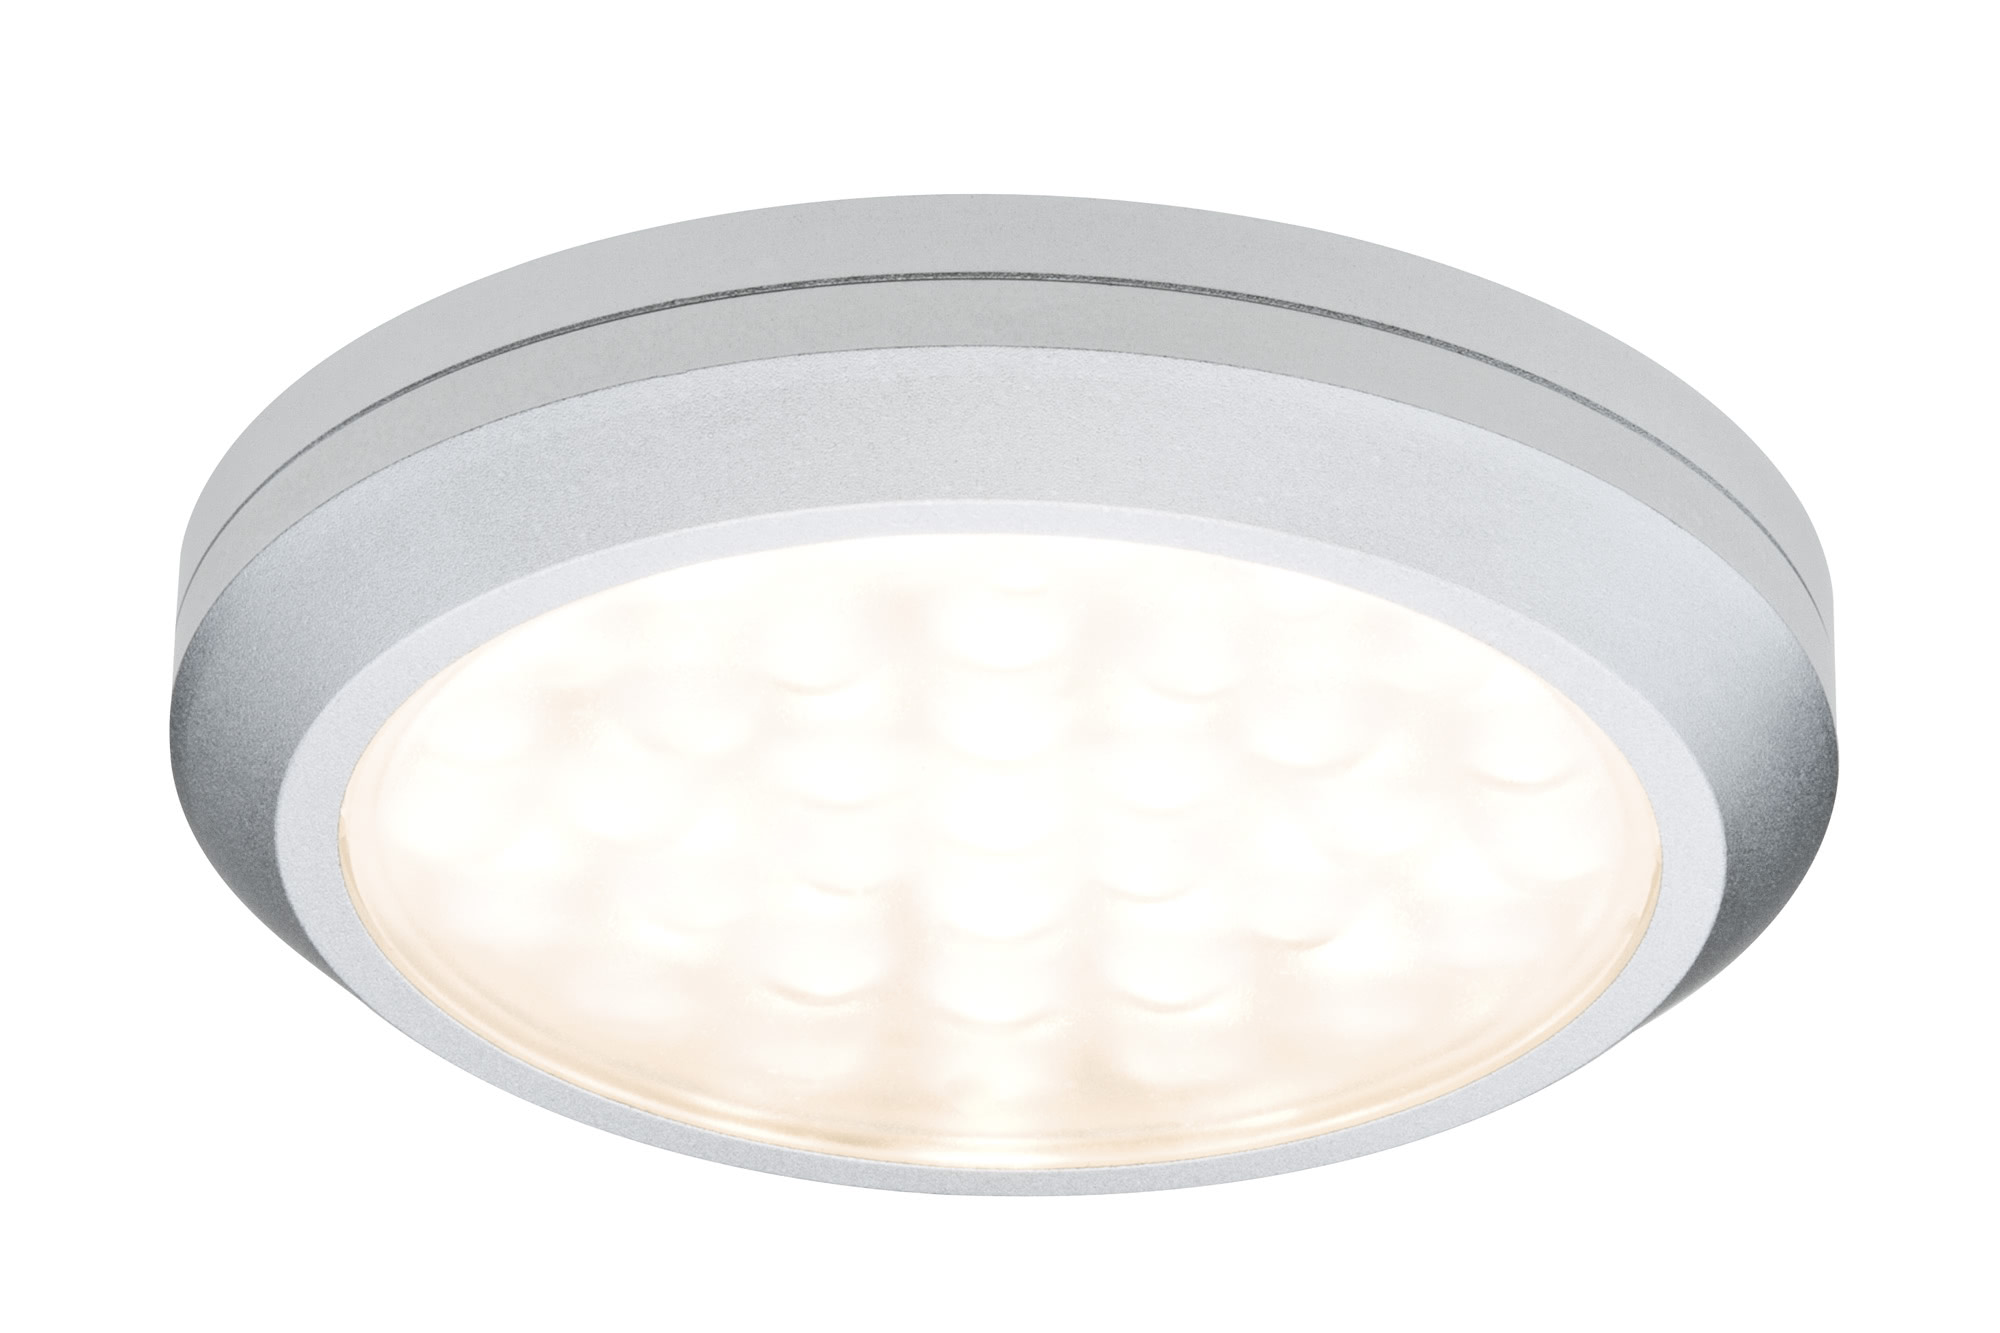 Paulmann. 93545 Комплект светильников dimmbar LED 5x2,8W, хром матовый